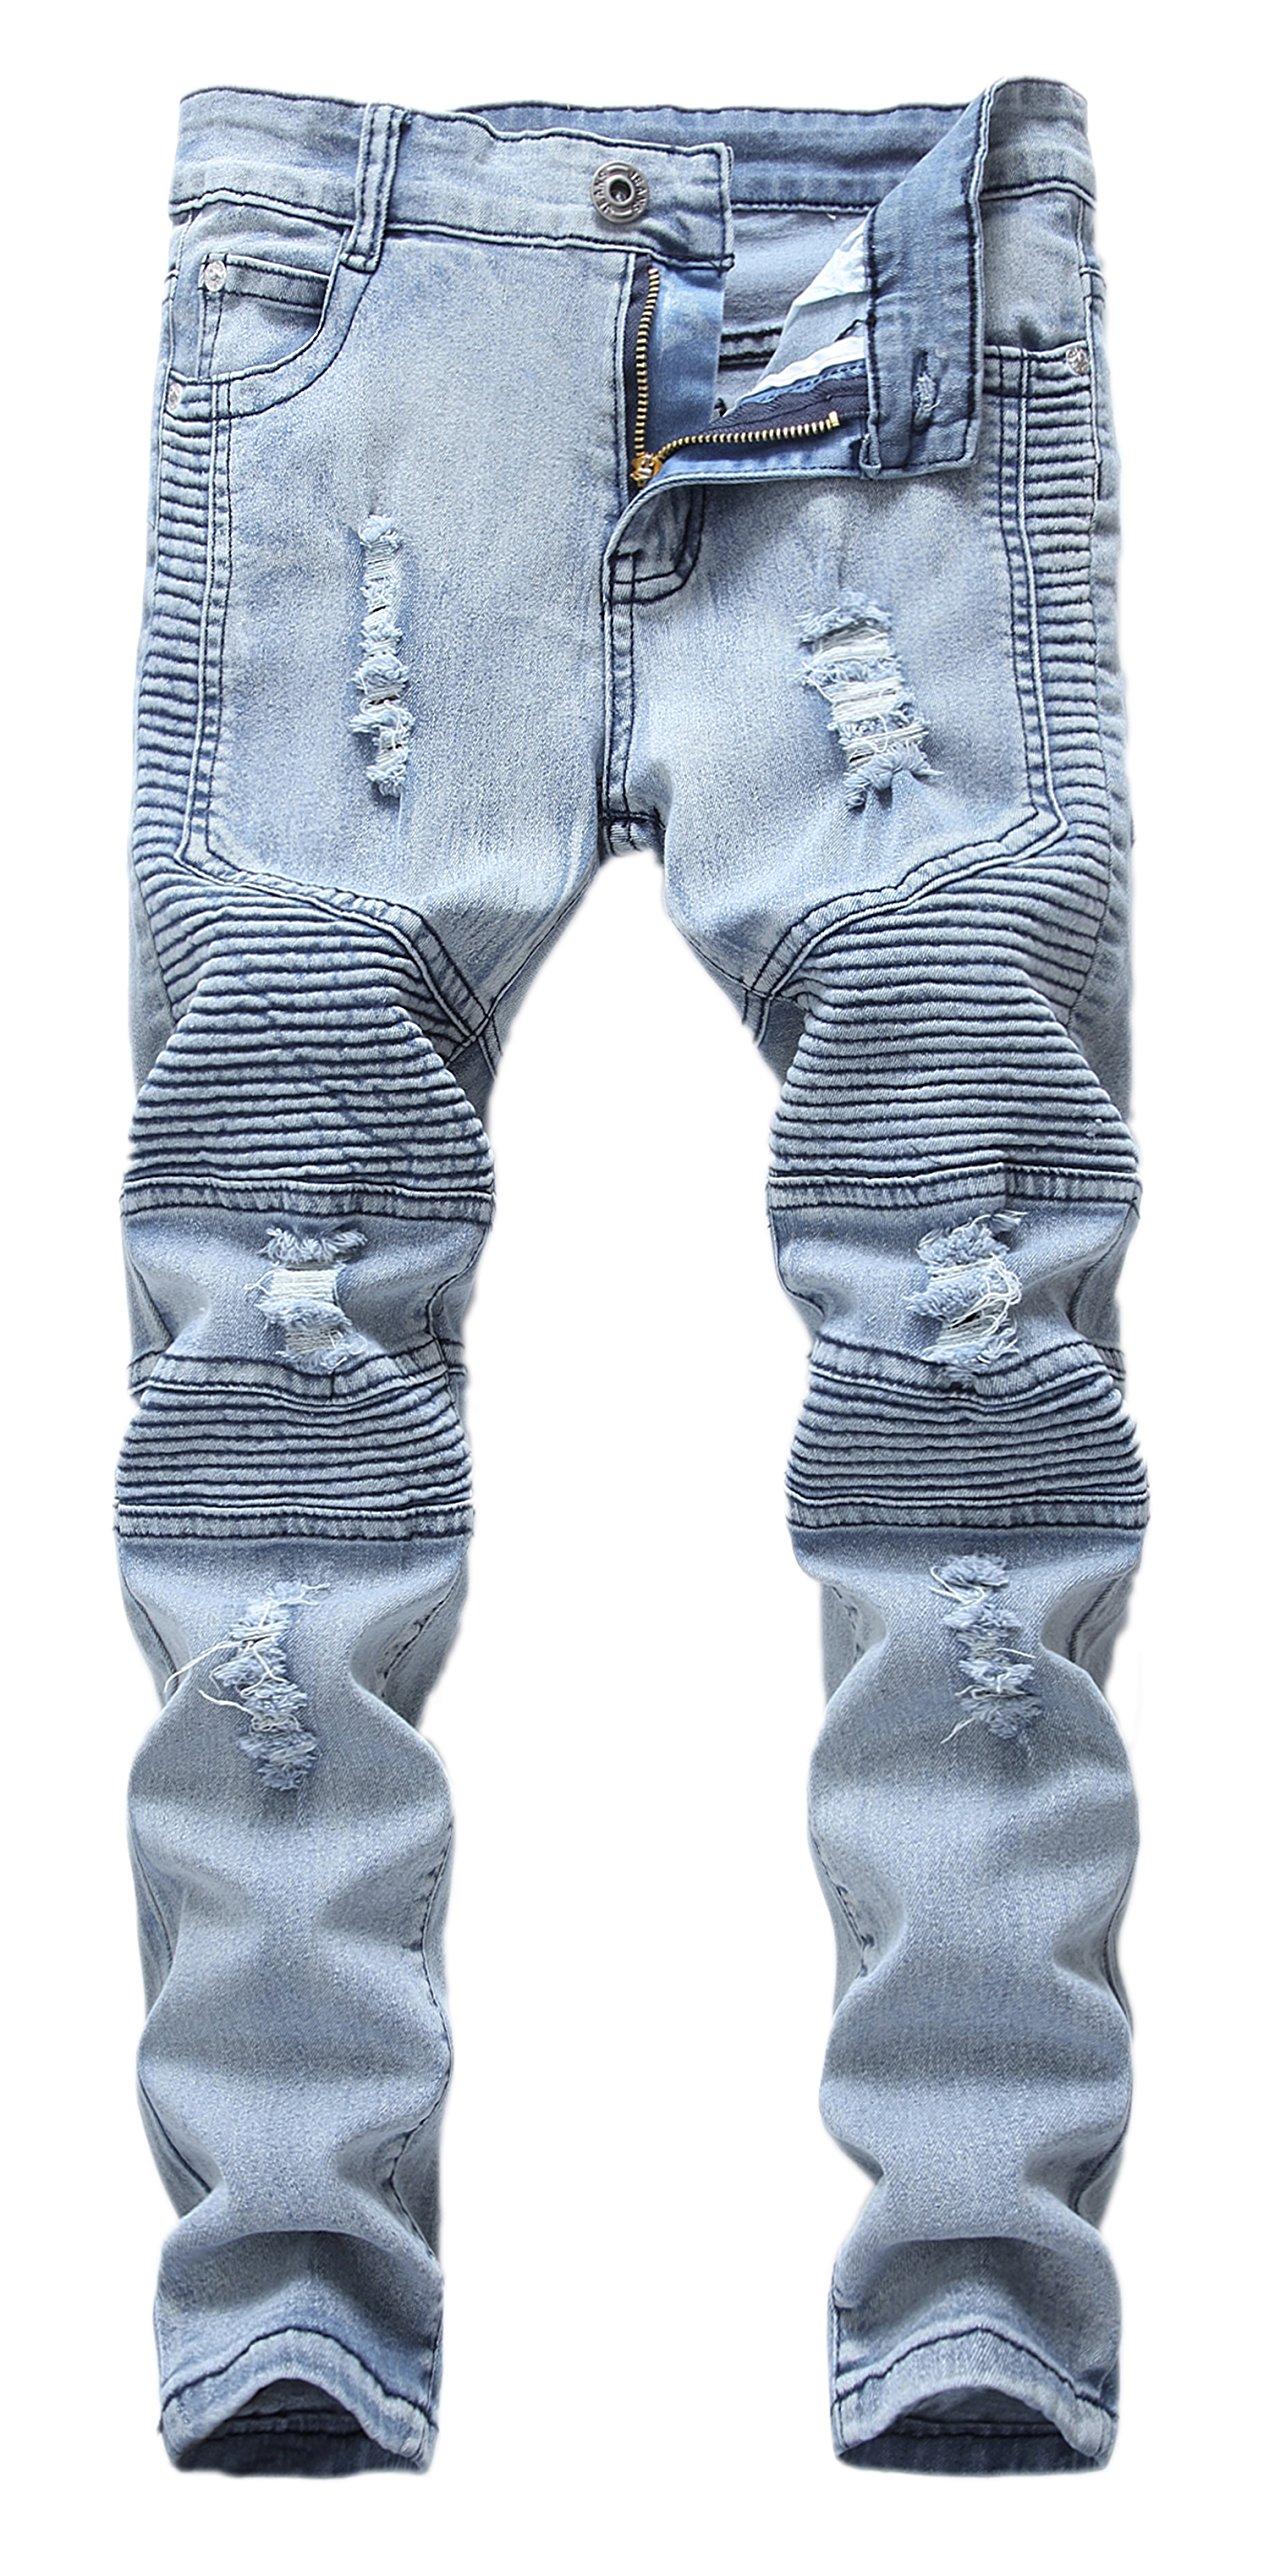 GUNLIRE Boy's Light Blue Biker Jeans Ripped Distressed Skinny Stretch Slim Denim Pants